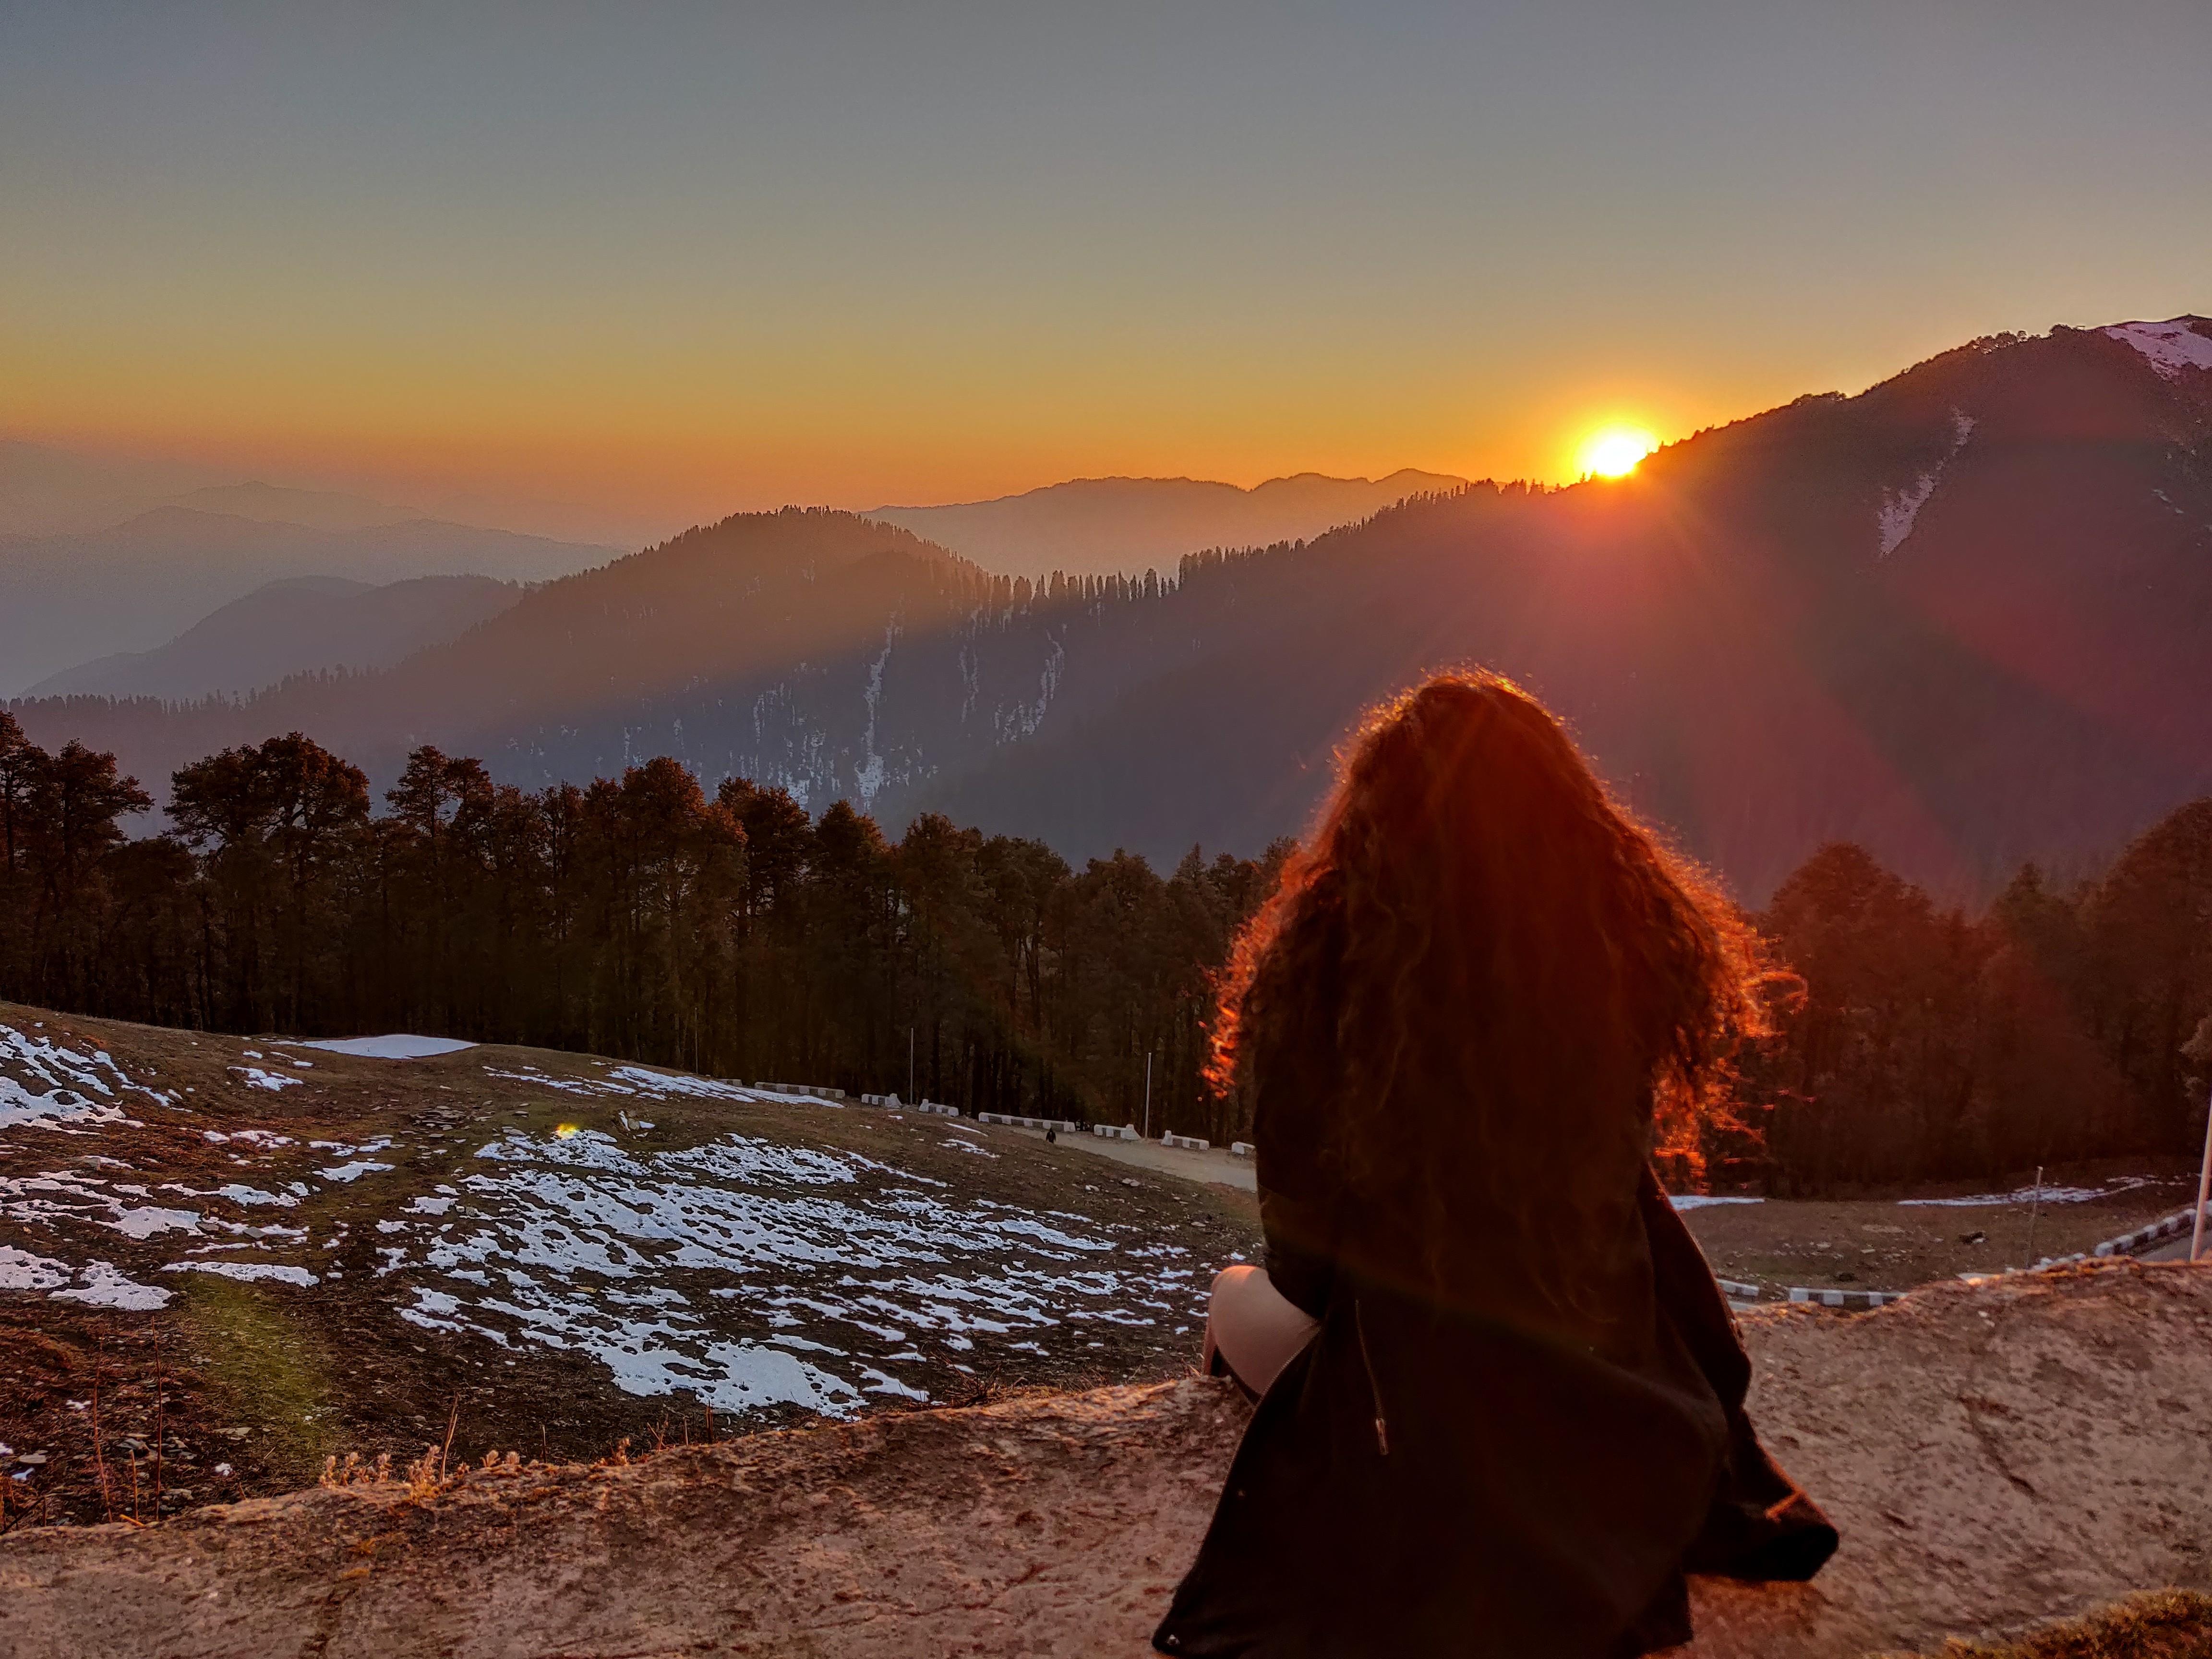 Sunrise, Tirthan Valley